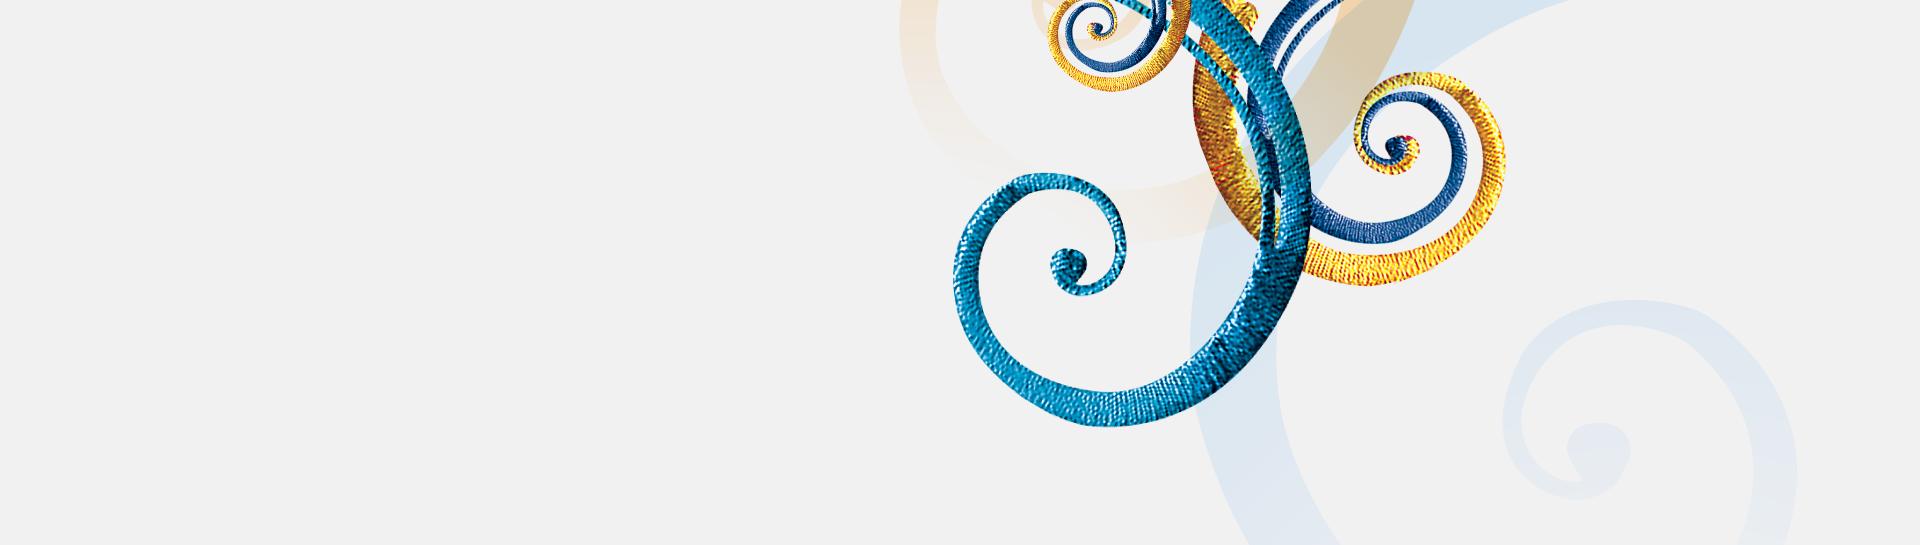 2021_layoutC_Embroidery_i2-02.png